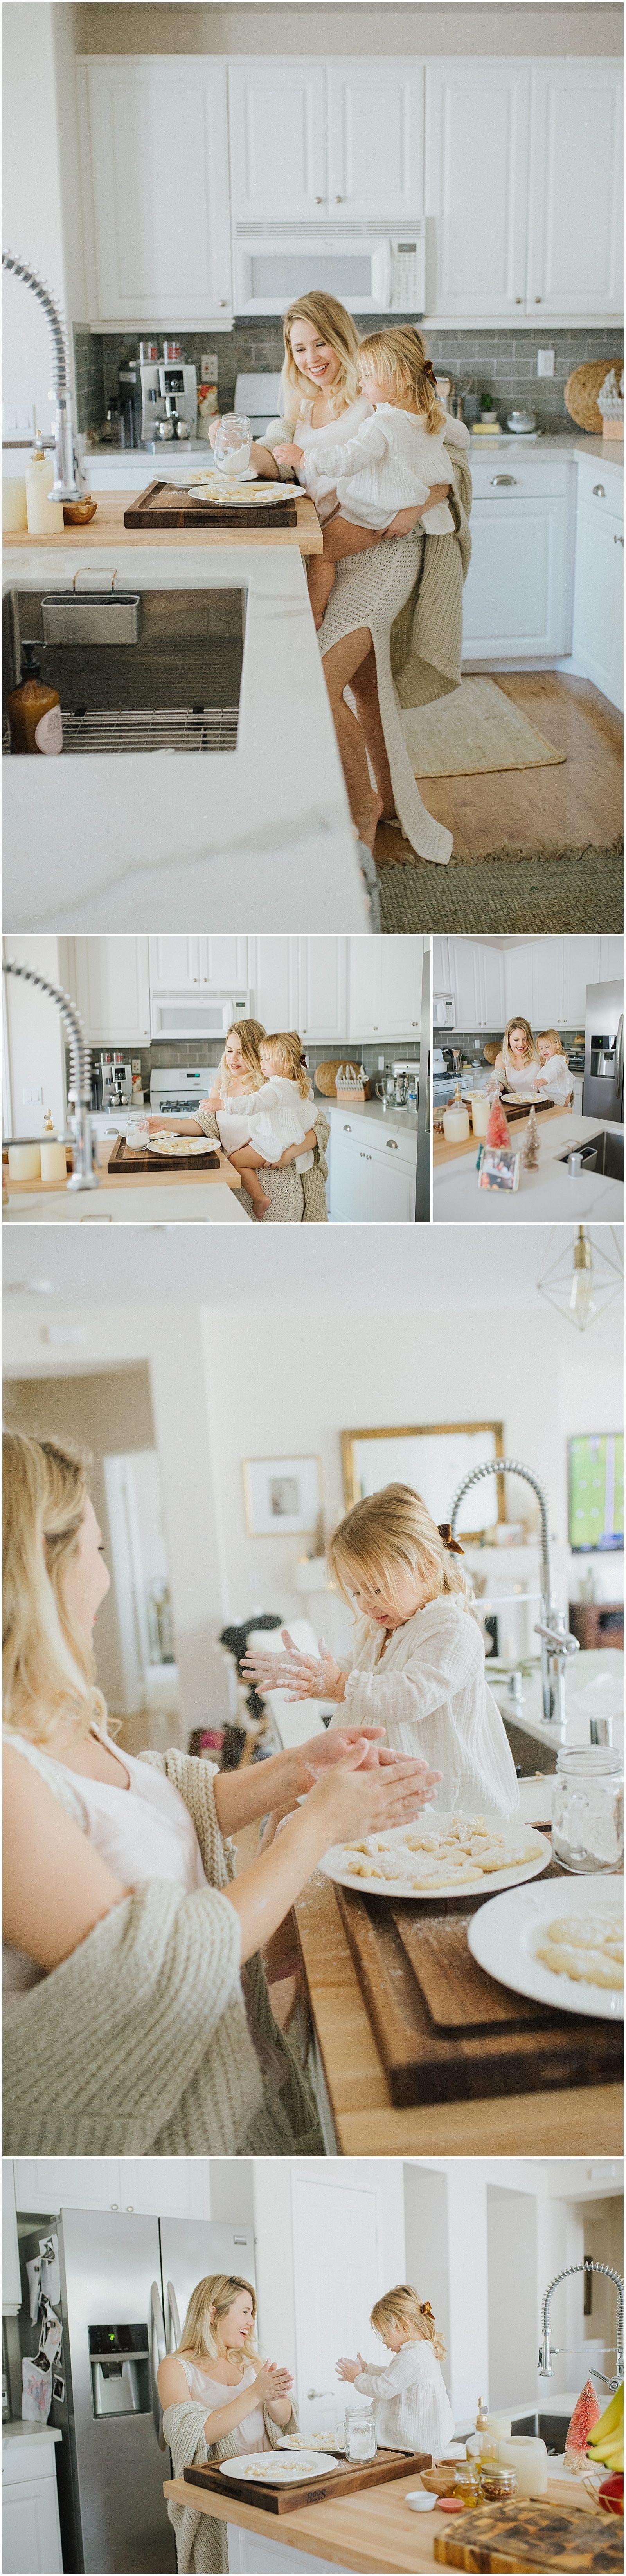 Orange County Family Lifestyle Photographer Sonja Hammad Photography 0132